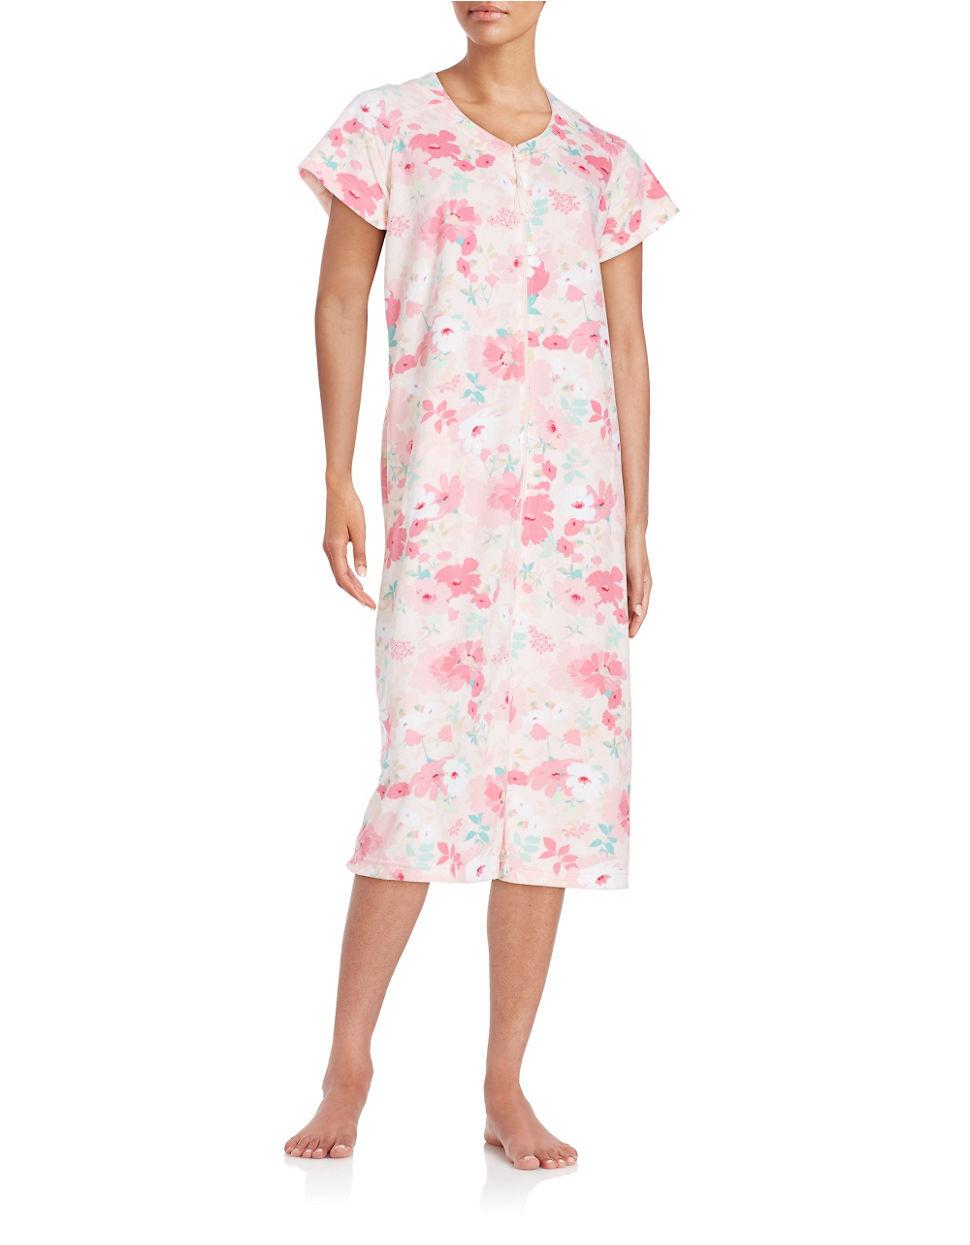 d52d5cdcbd Lyst - Miss elaine Floral Mumu Duster Robe